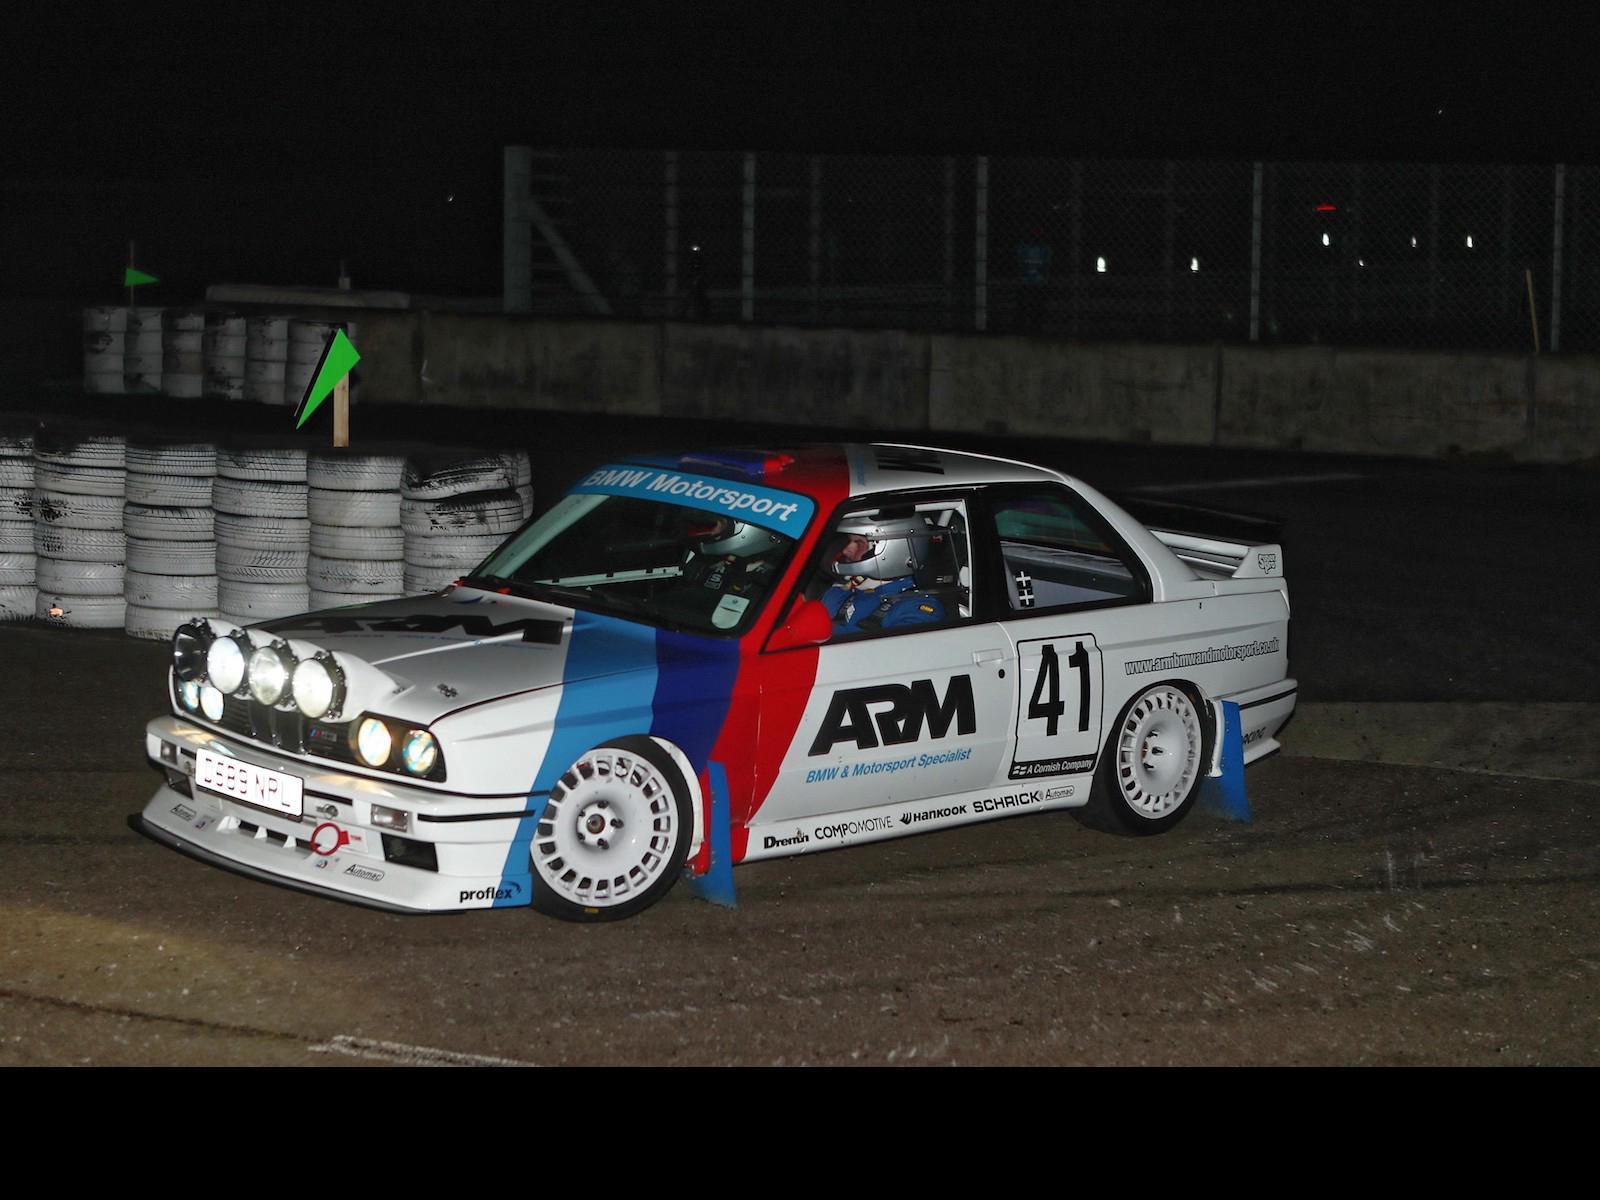 National rally cars in profile: Joe Geach's BMW E30 M3